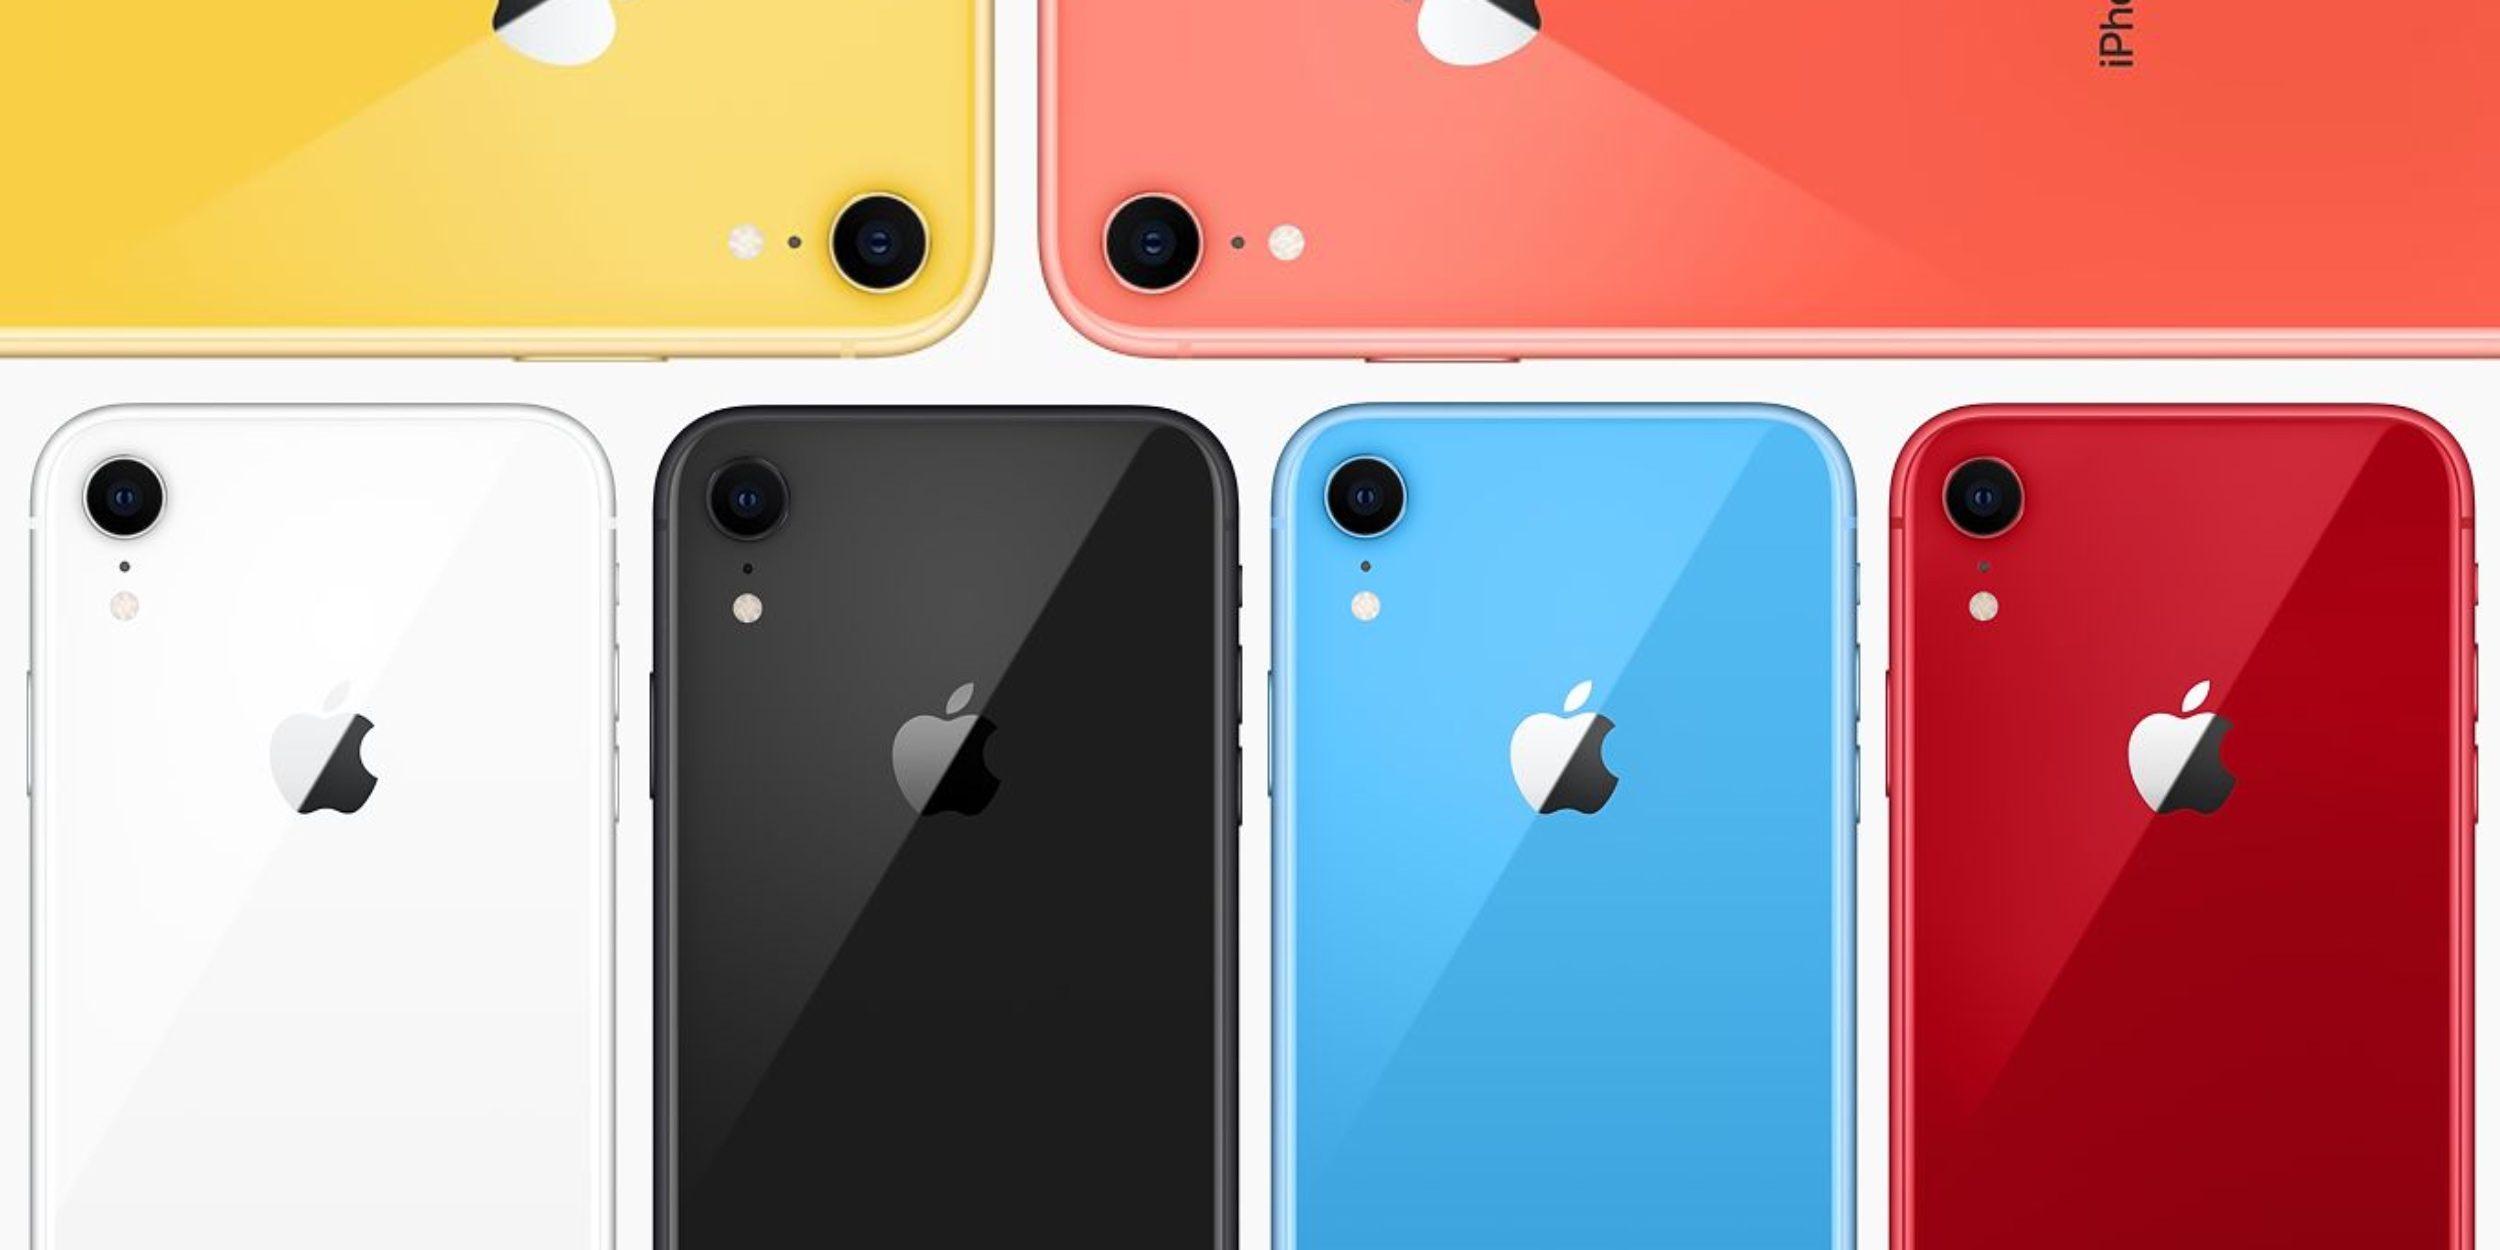 「iPhoneXR」の画像検索結果